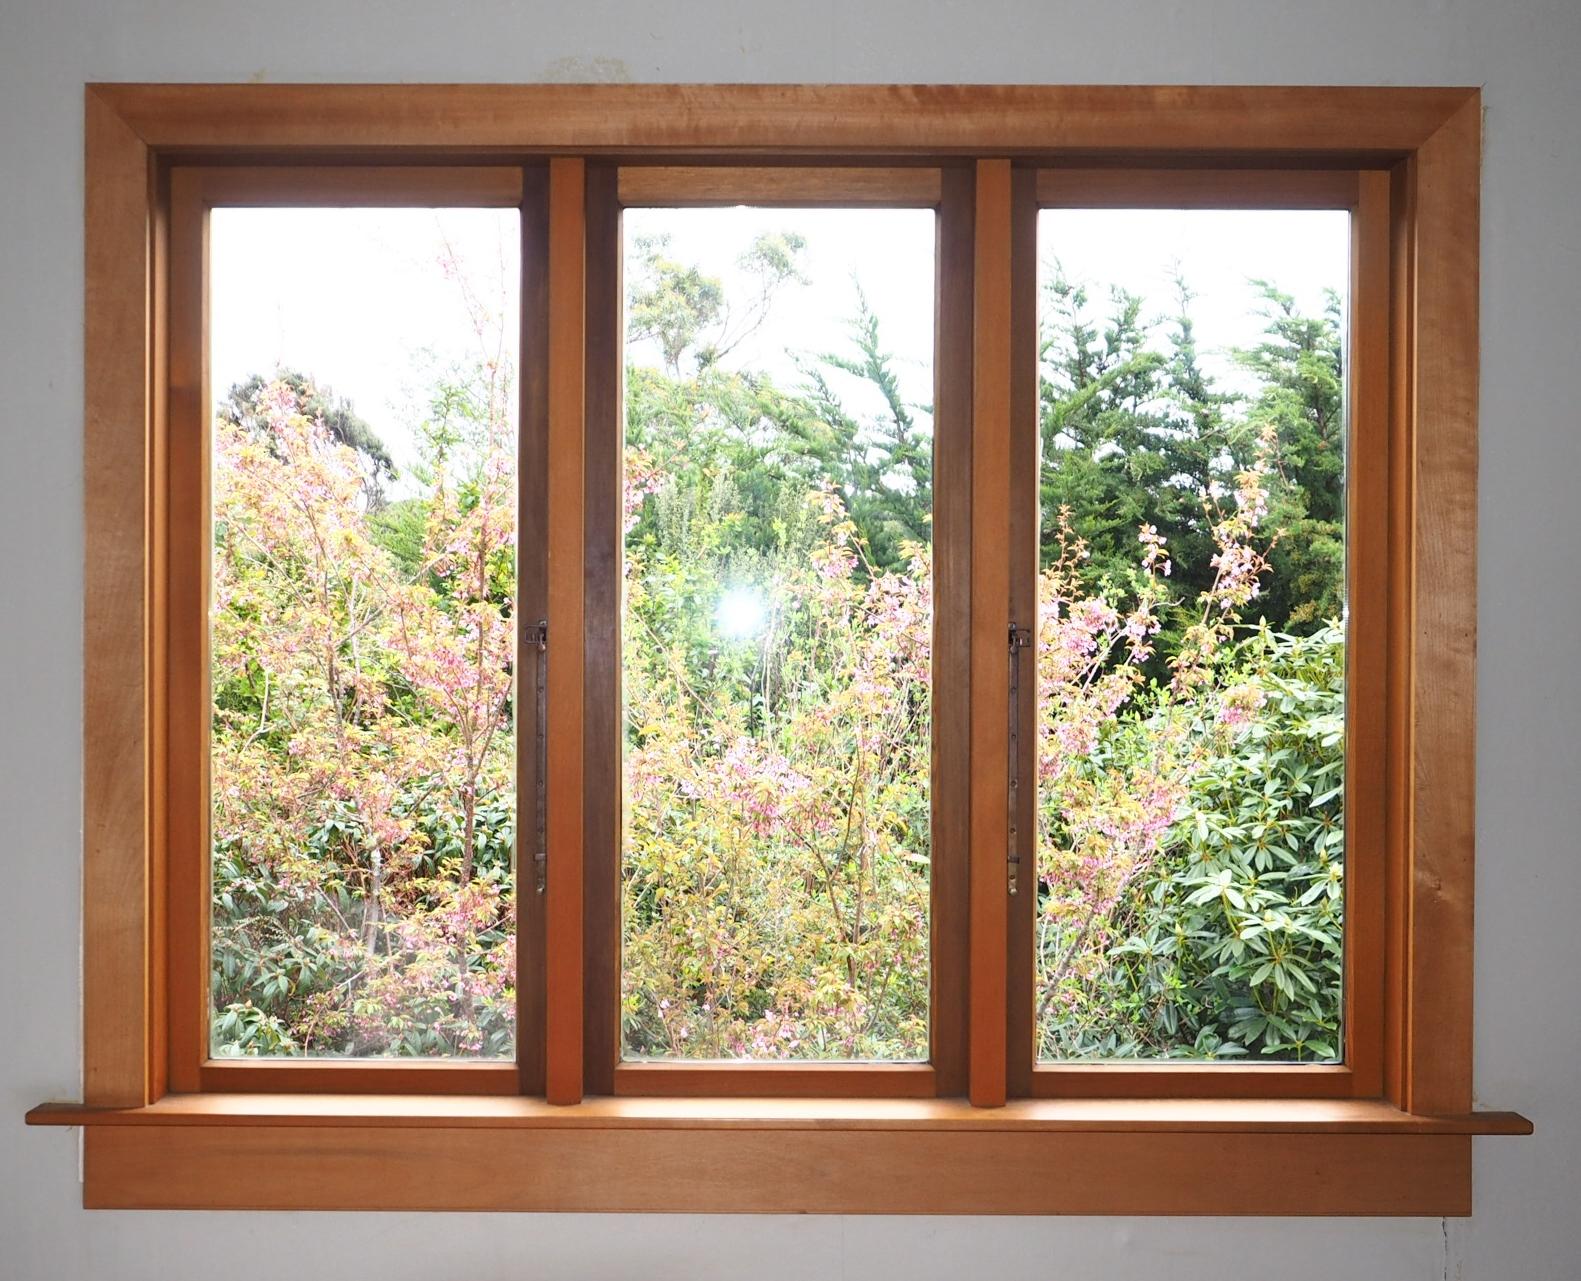 Double glazed windows, Invercargill, Queenstown, Double glazed windows,Timber, Furniture, Joinery, Kitchens 1.JPG